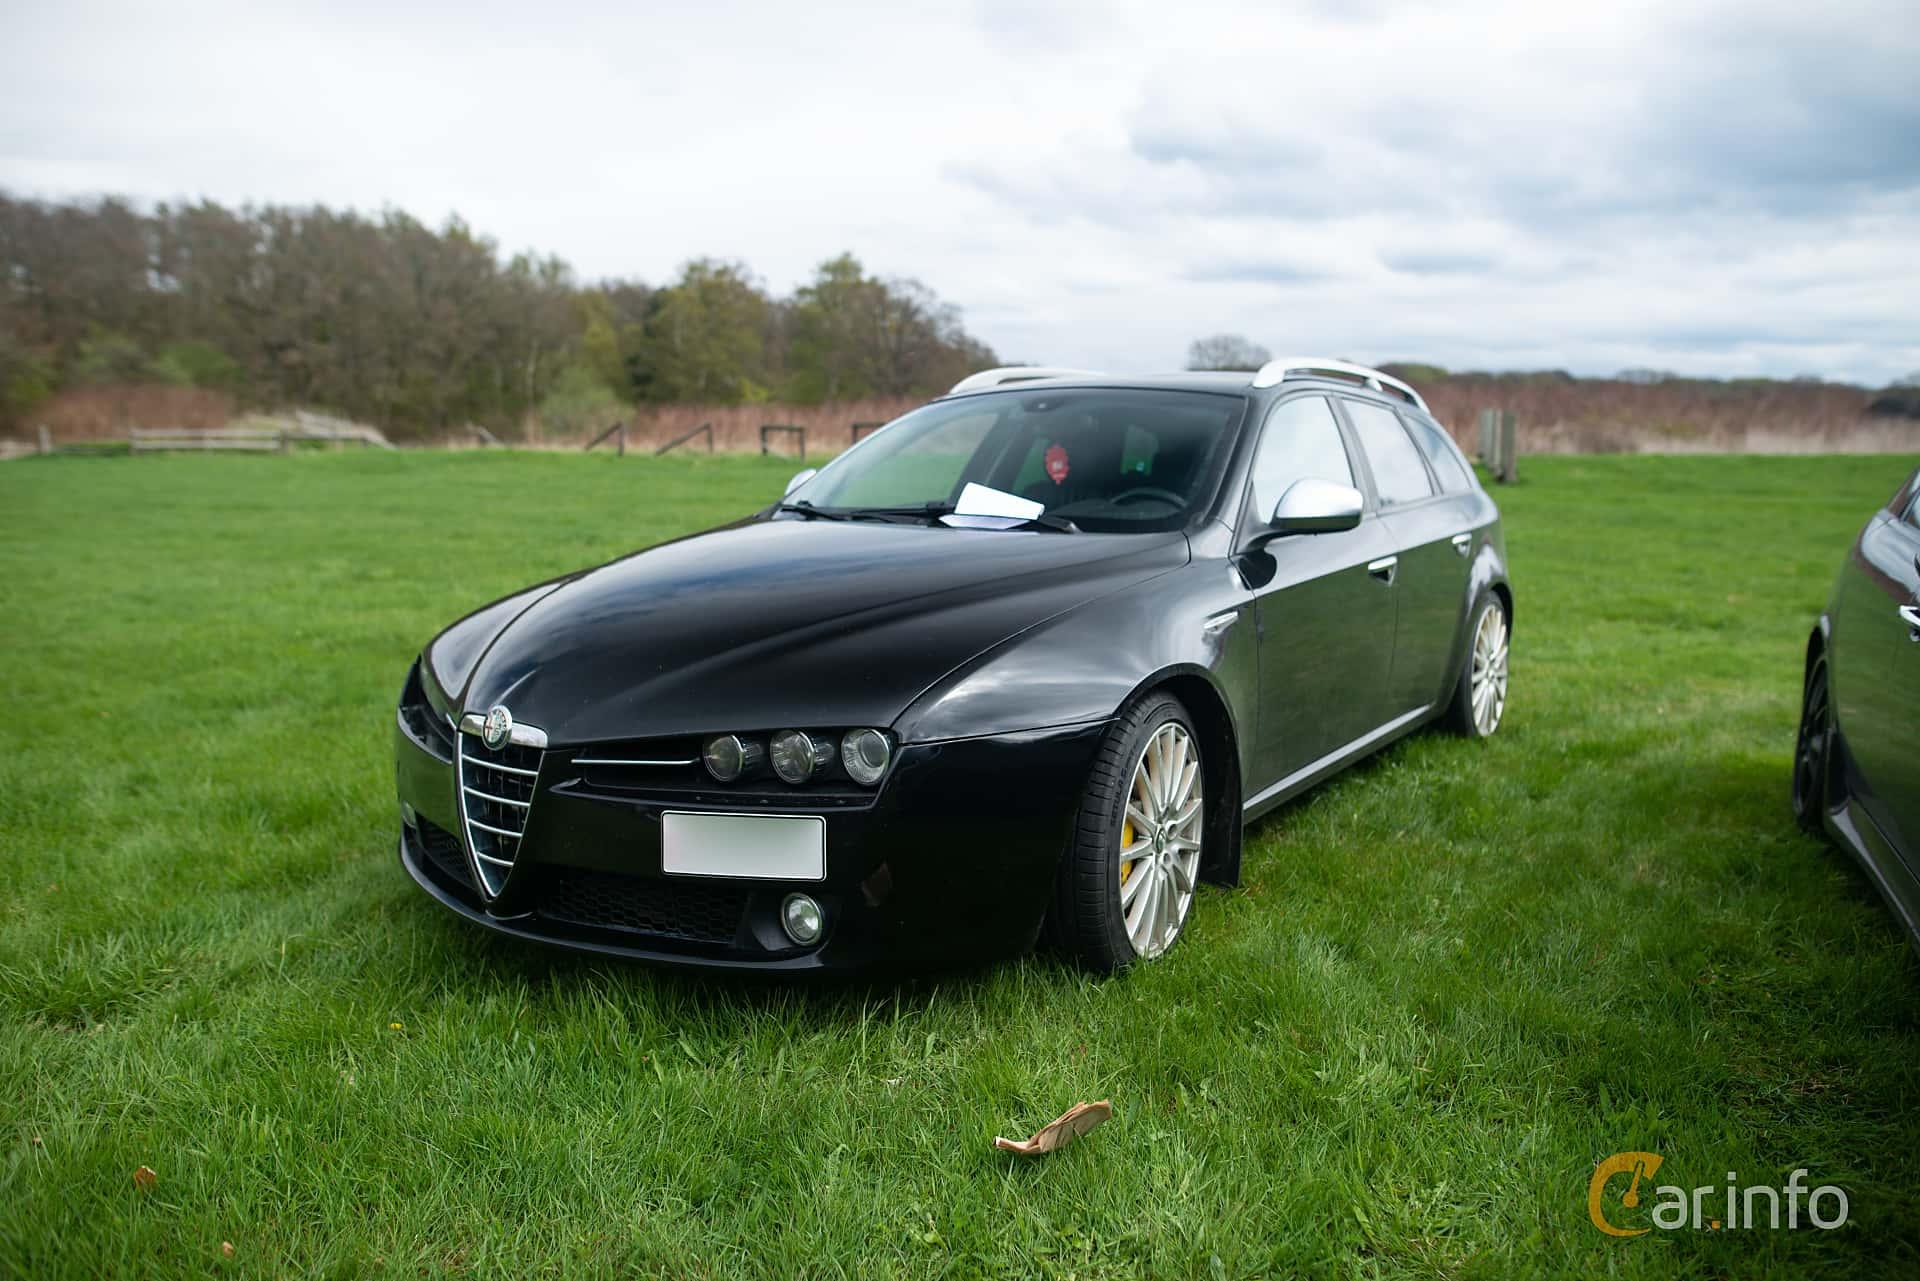 4 Images Of Alfa Romeo 159 Sportwagon 3 2 Jts V6 24v Q4 Manual